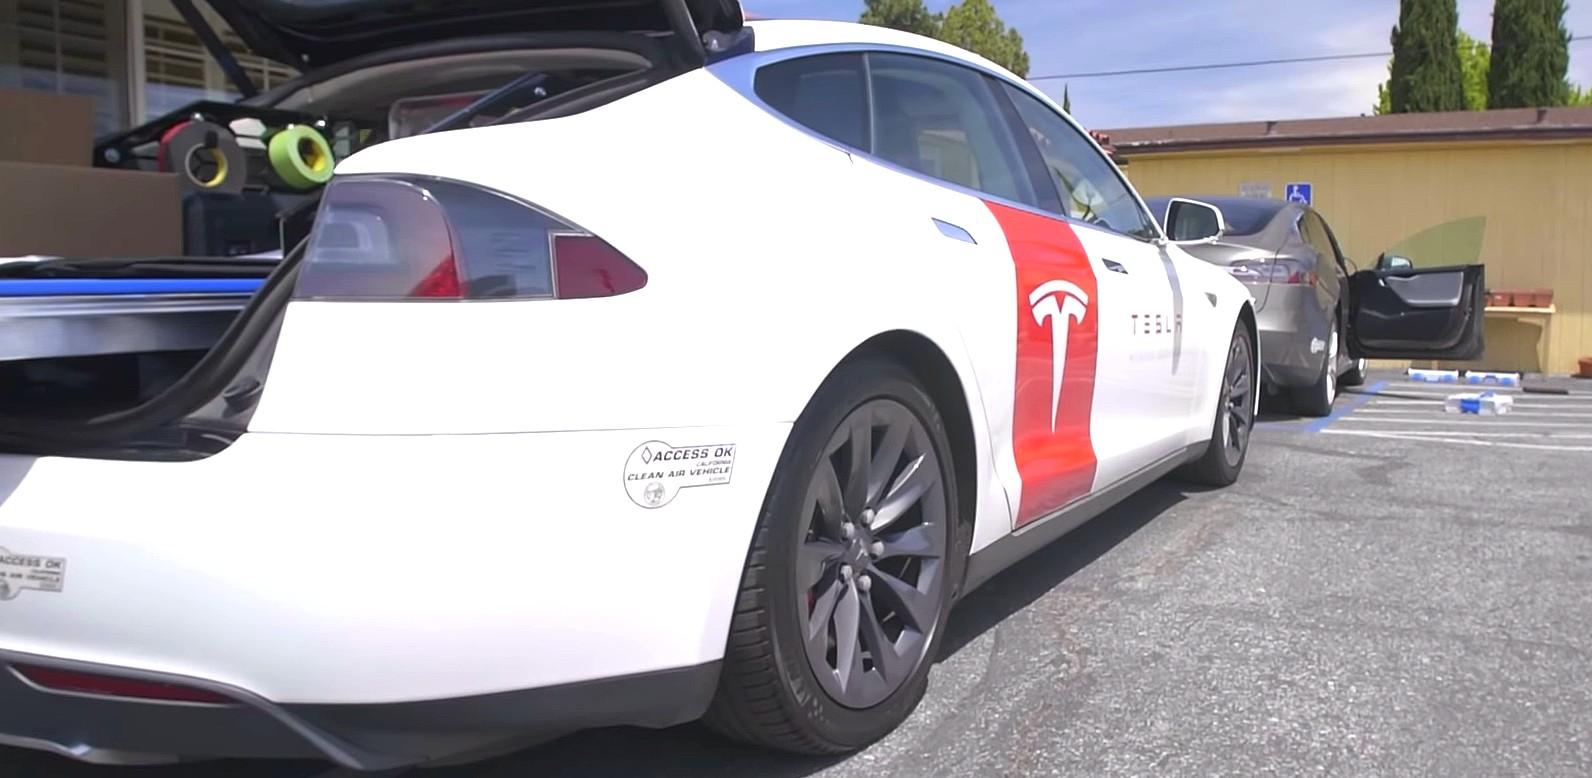 Tesla Nearly Doubles Mobile Service Fleet In Bid To Improve Customer Service